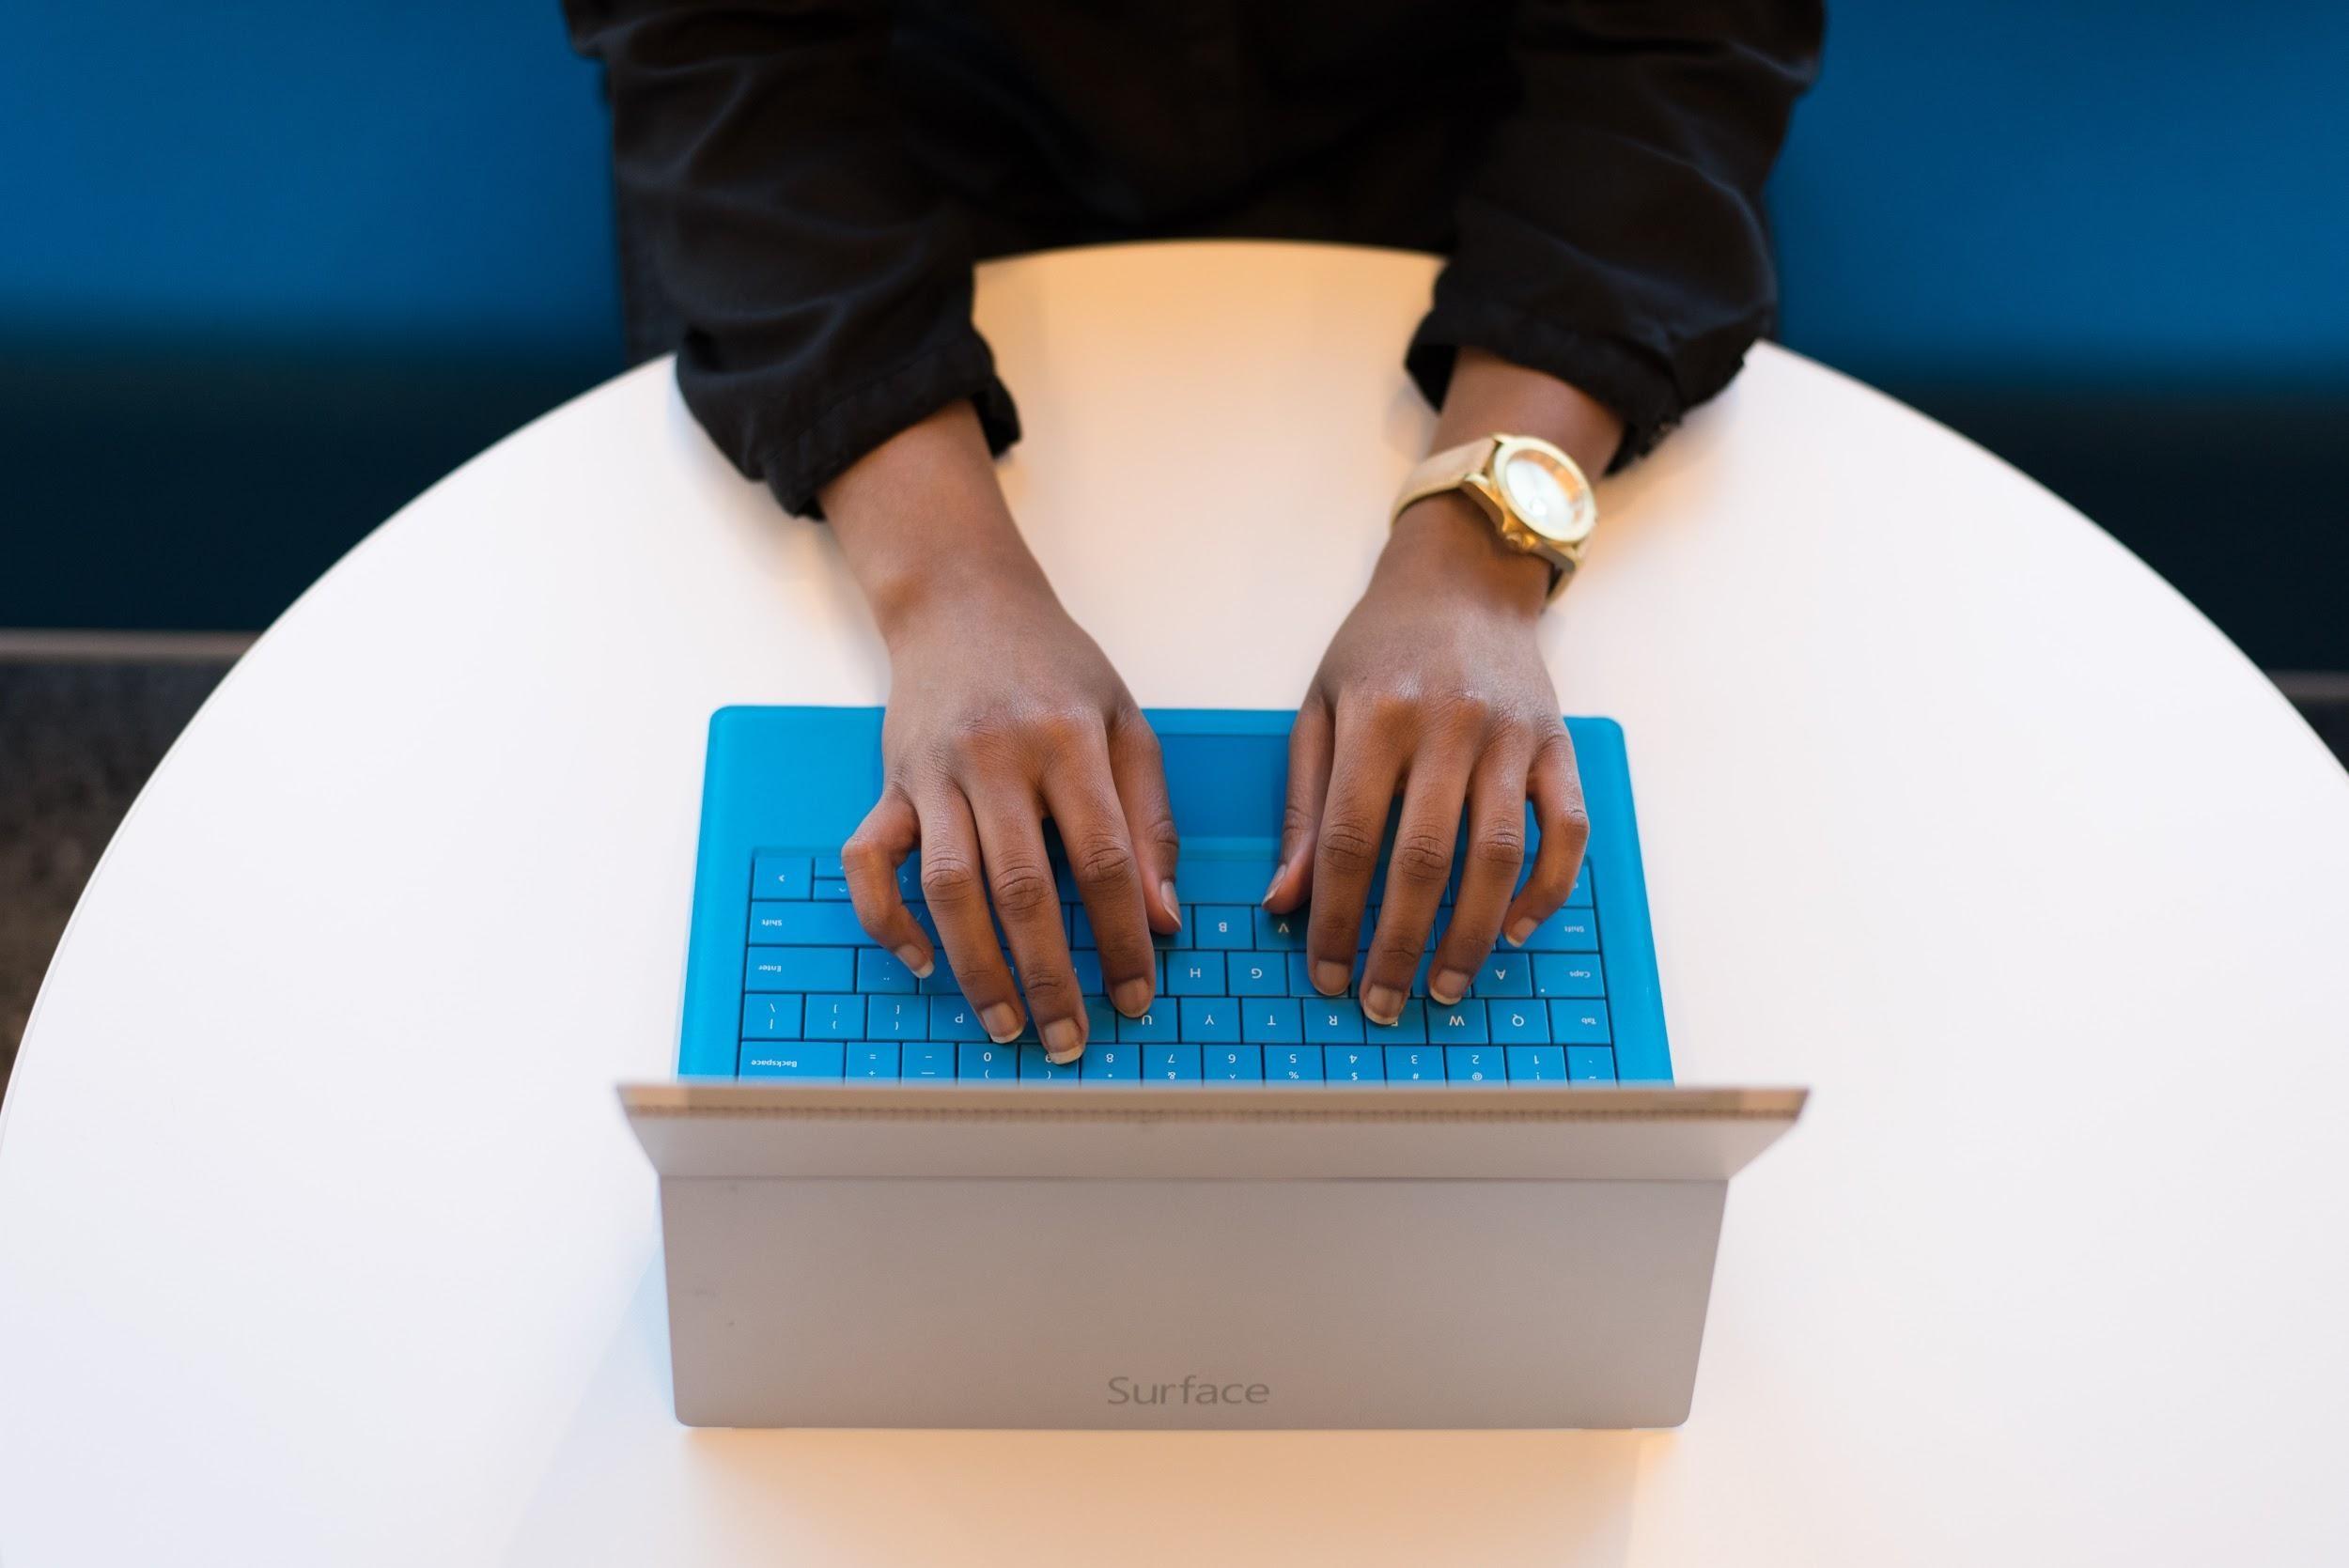 6 Most Correct Habits For A Web Developer